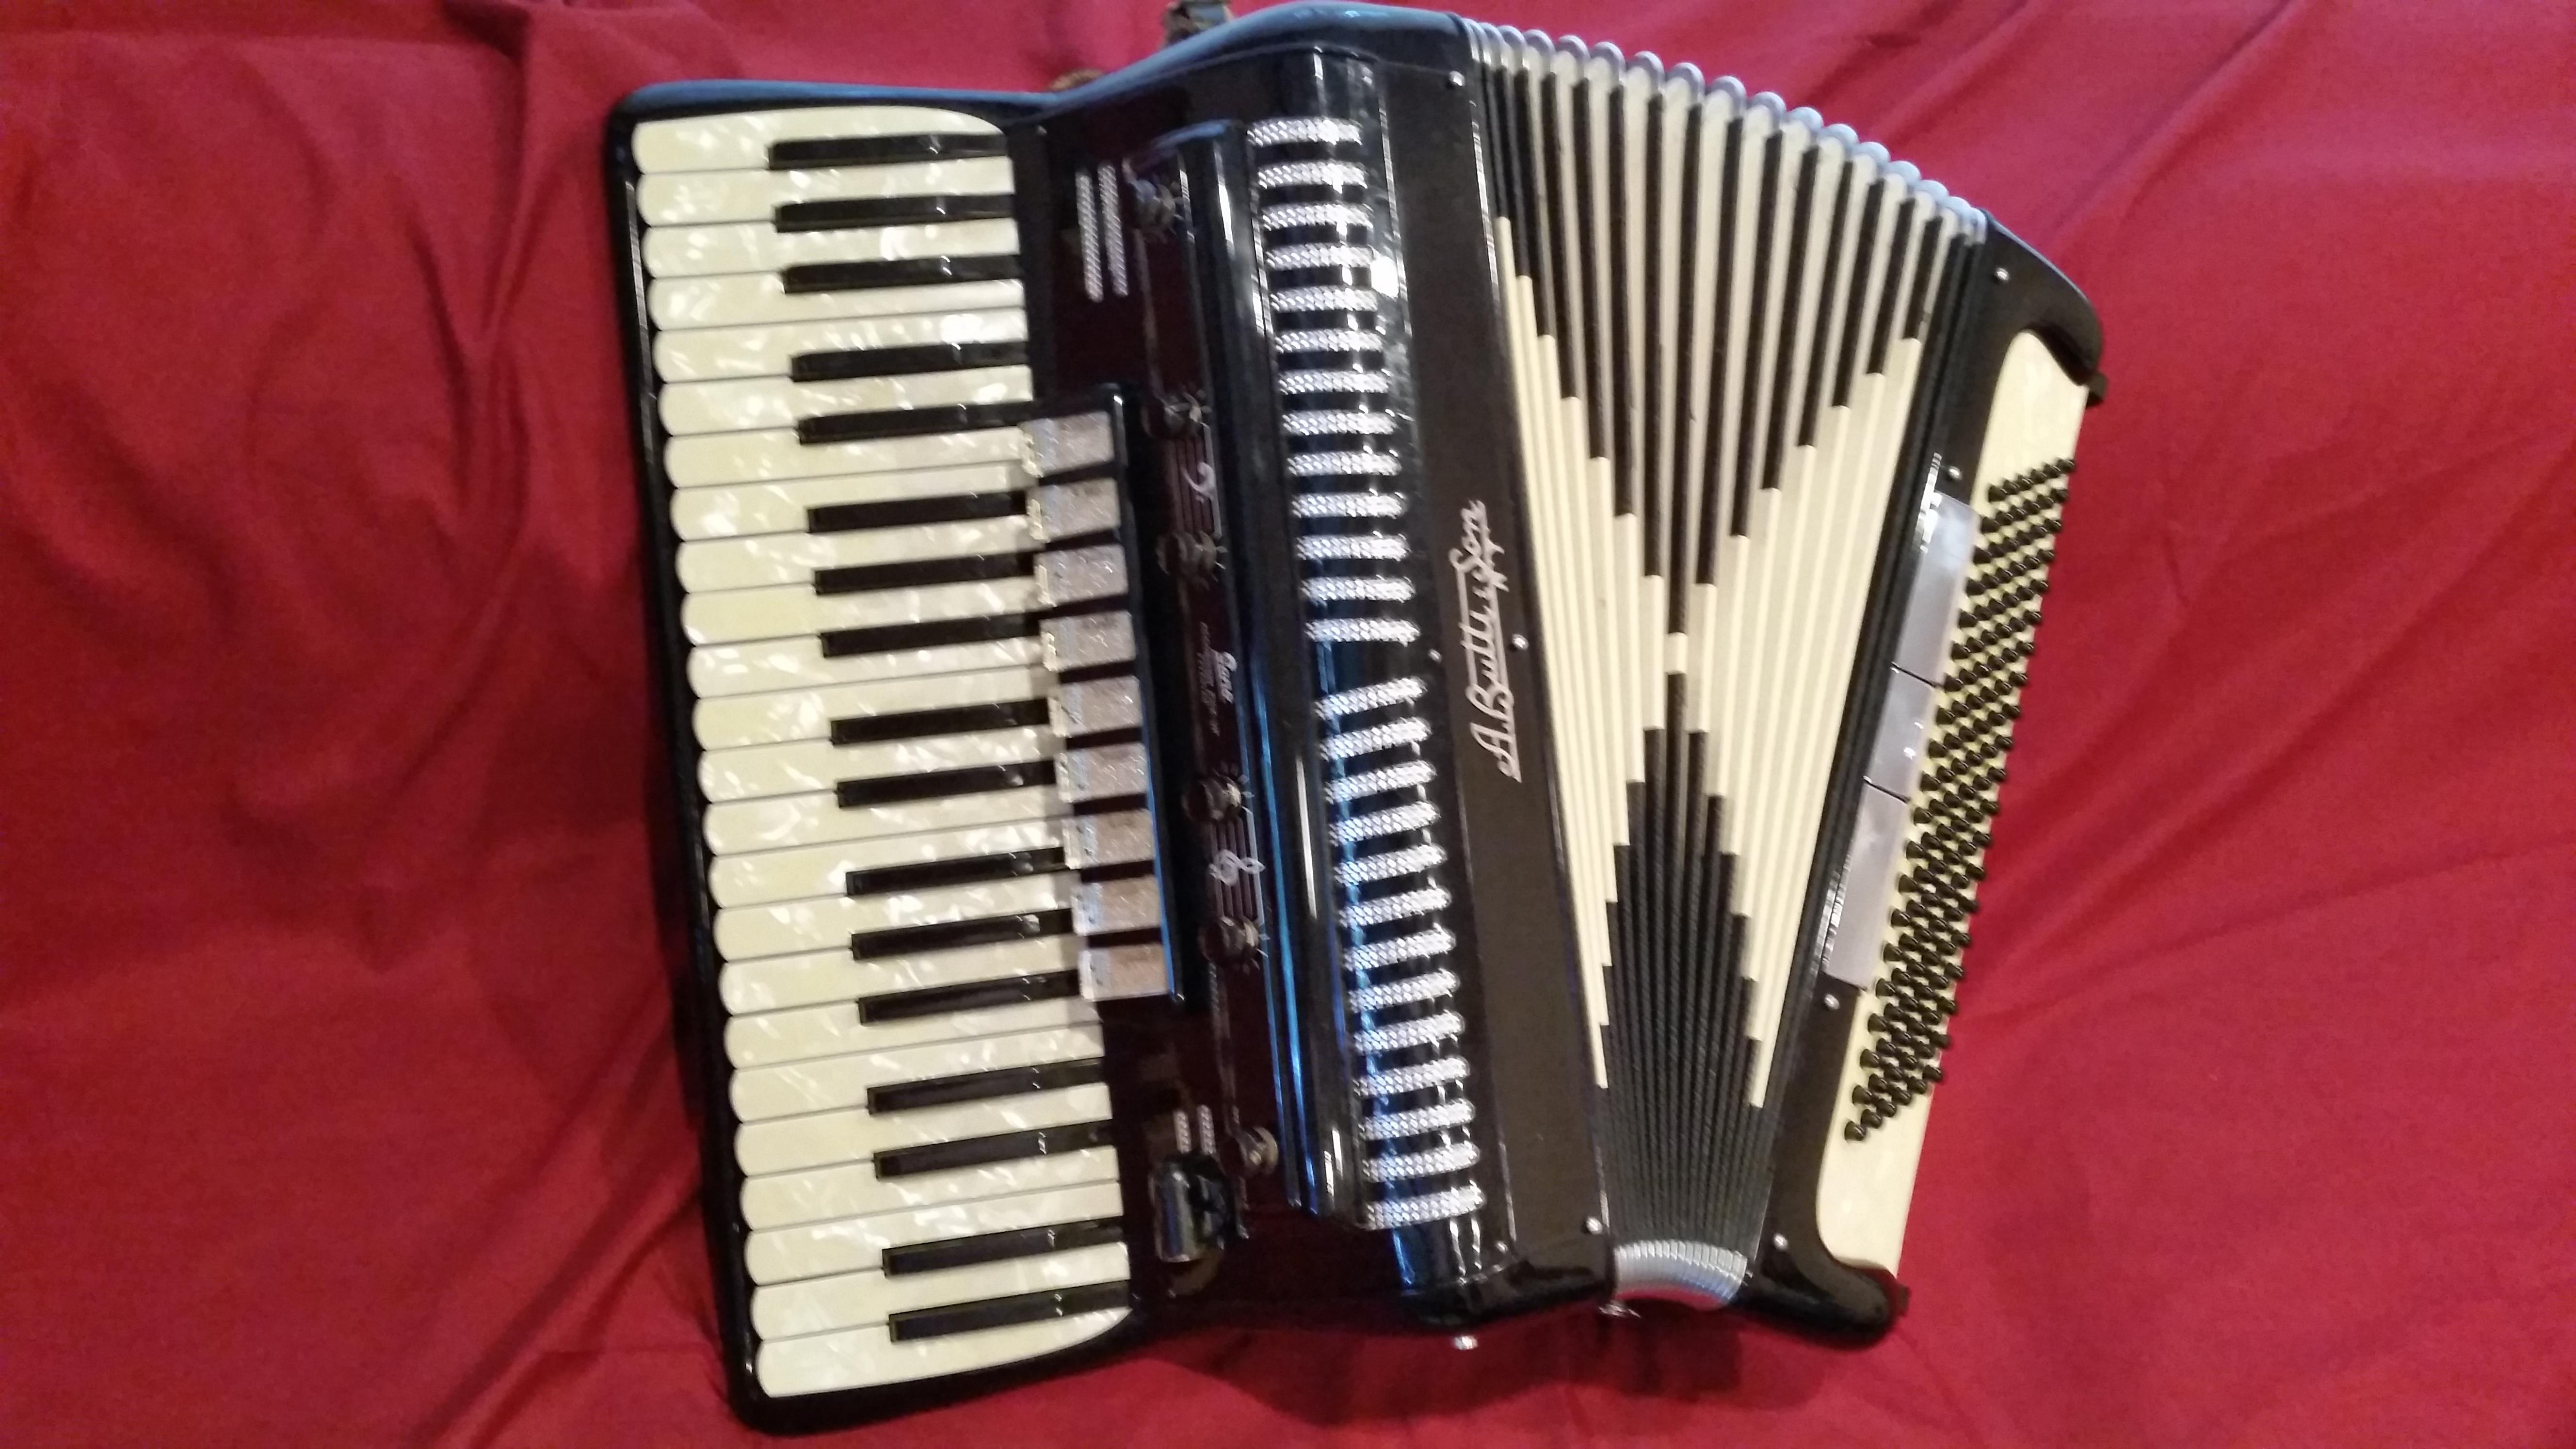 A._Butti_&_Son's_Professional_accordion.jpg